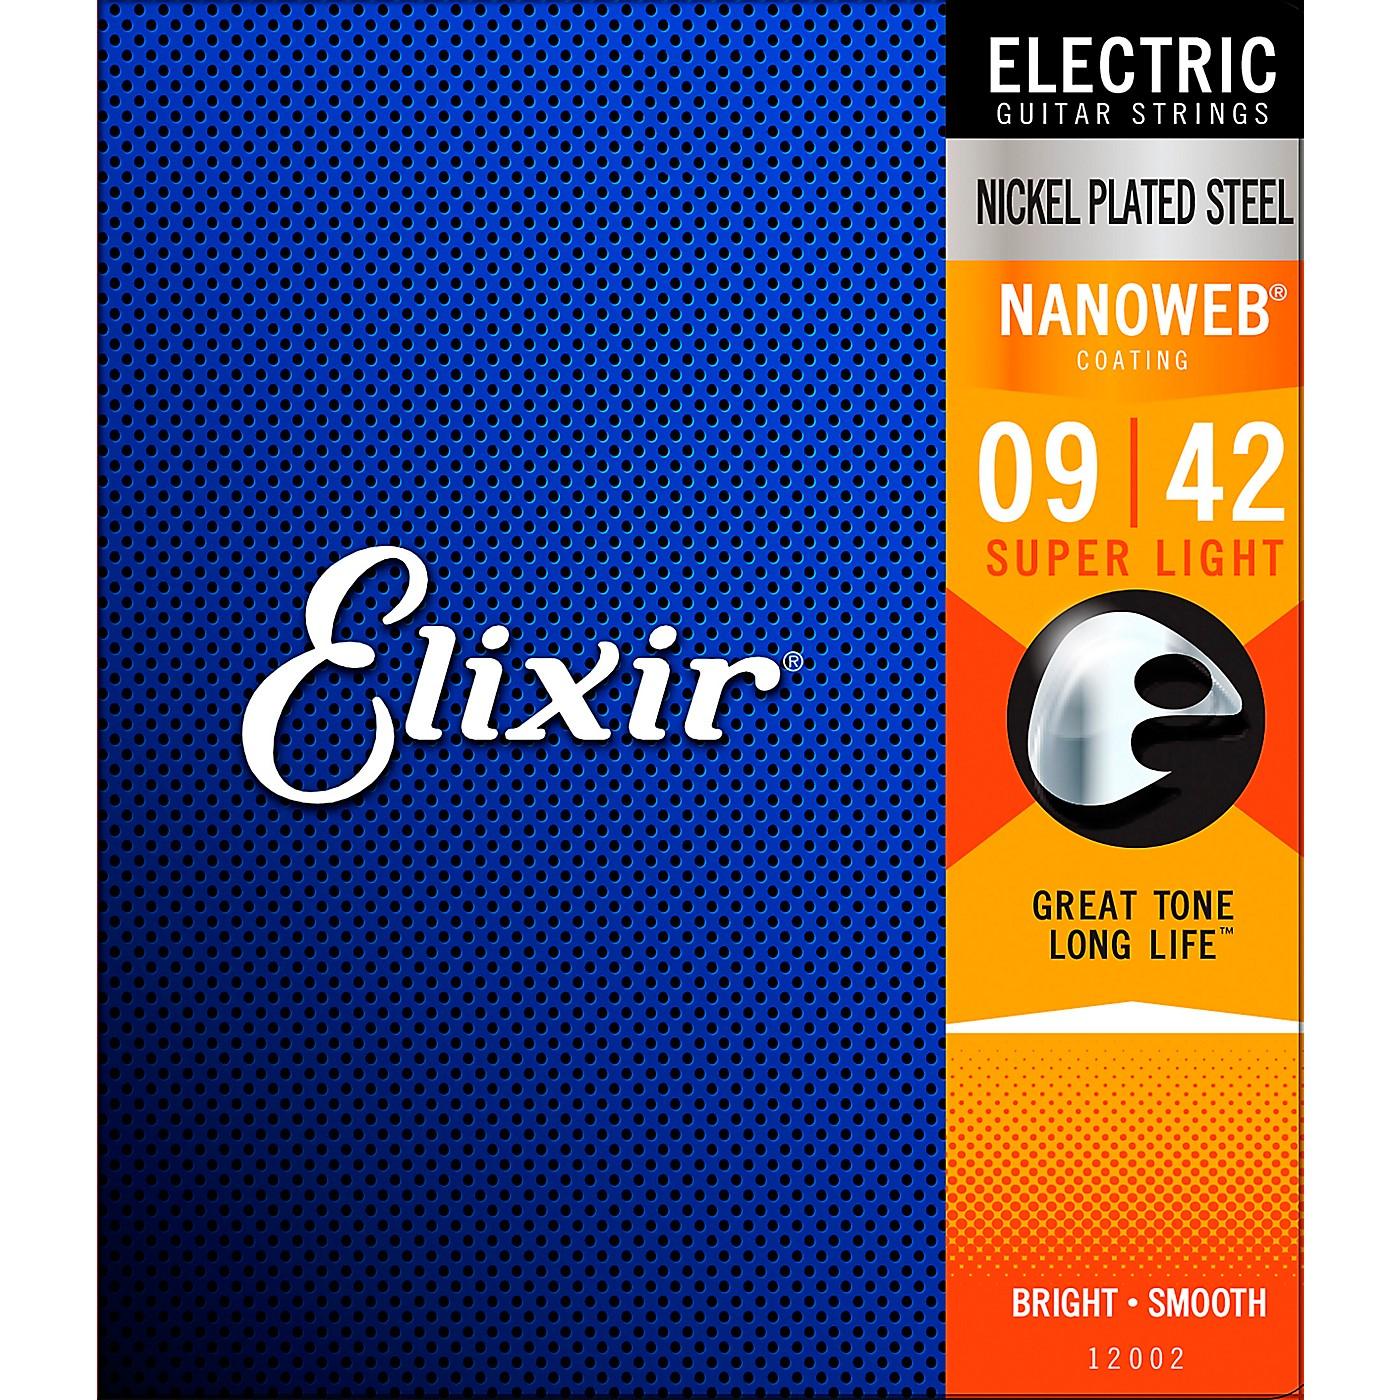 Elixir Electric Guitar Strings with NANOWEB Coating, Super Light (.009-.042) thumbnail